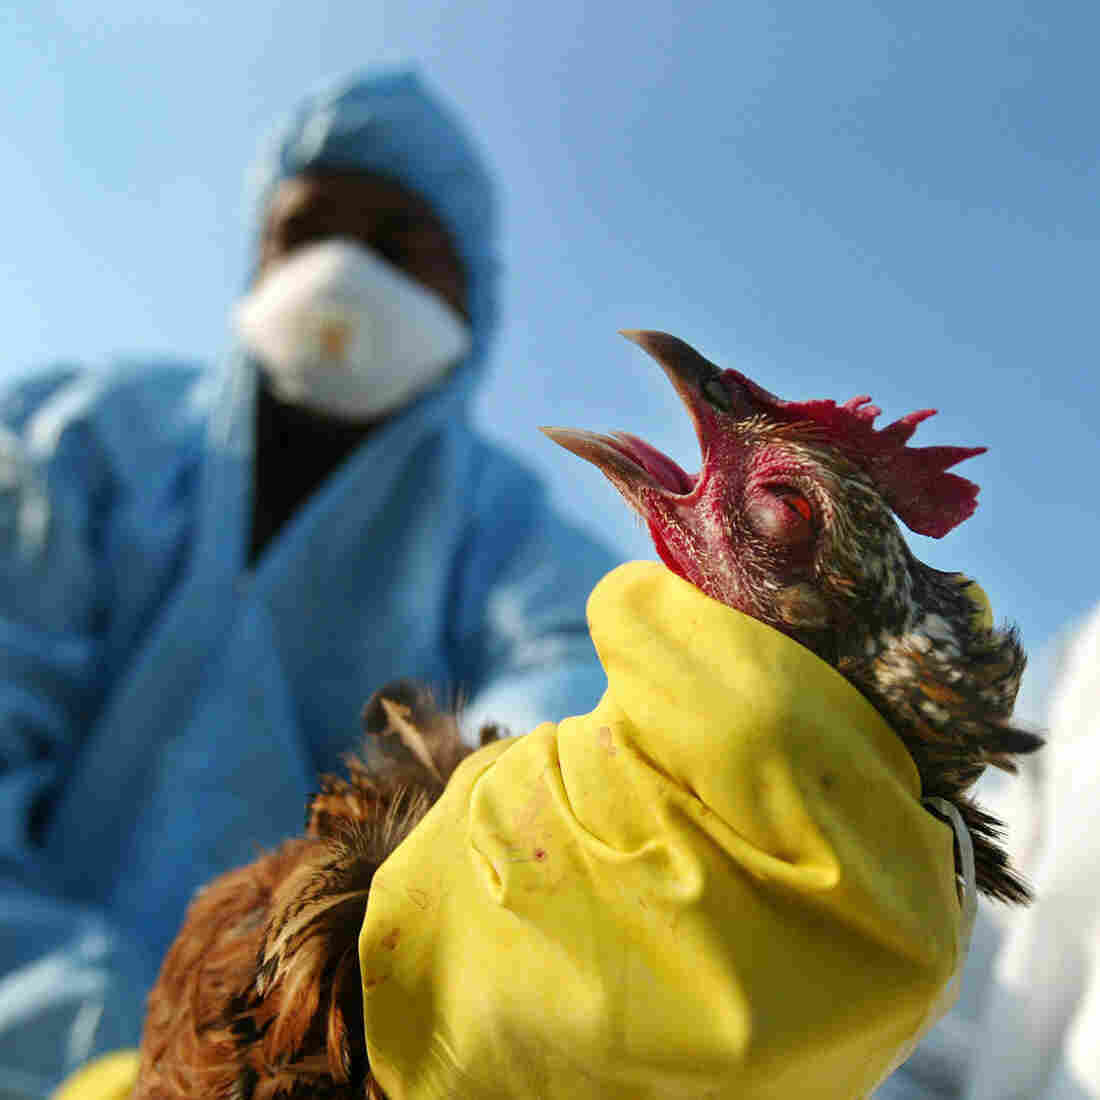 Biologists Choose Sides In Safety Debate Over Lab-Made Pathogens